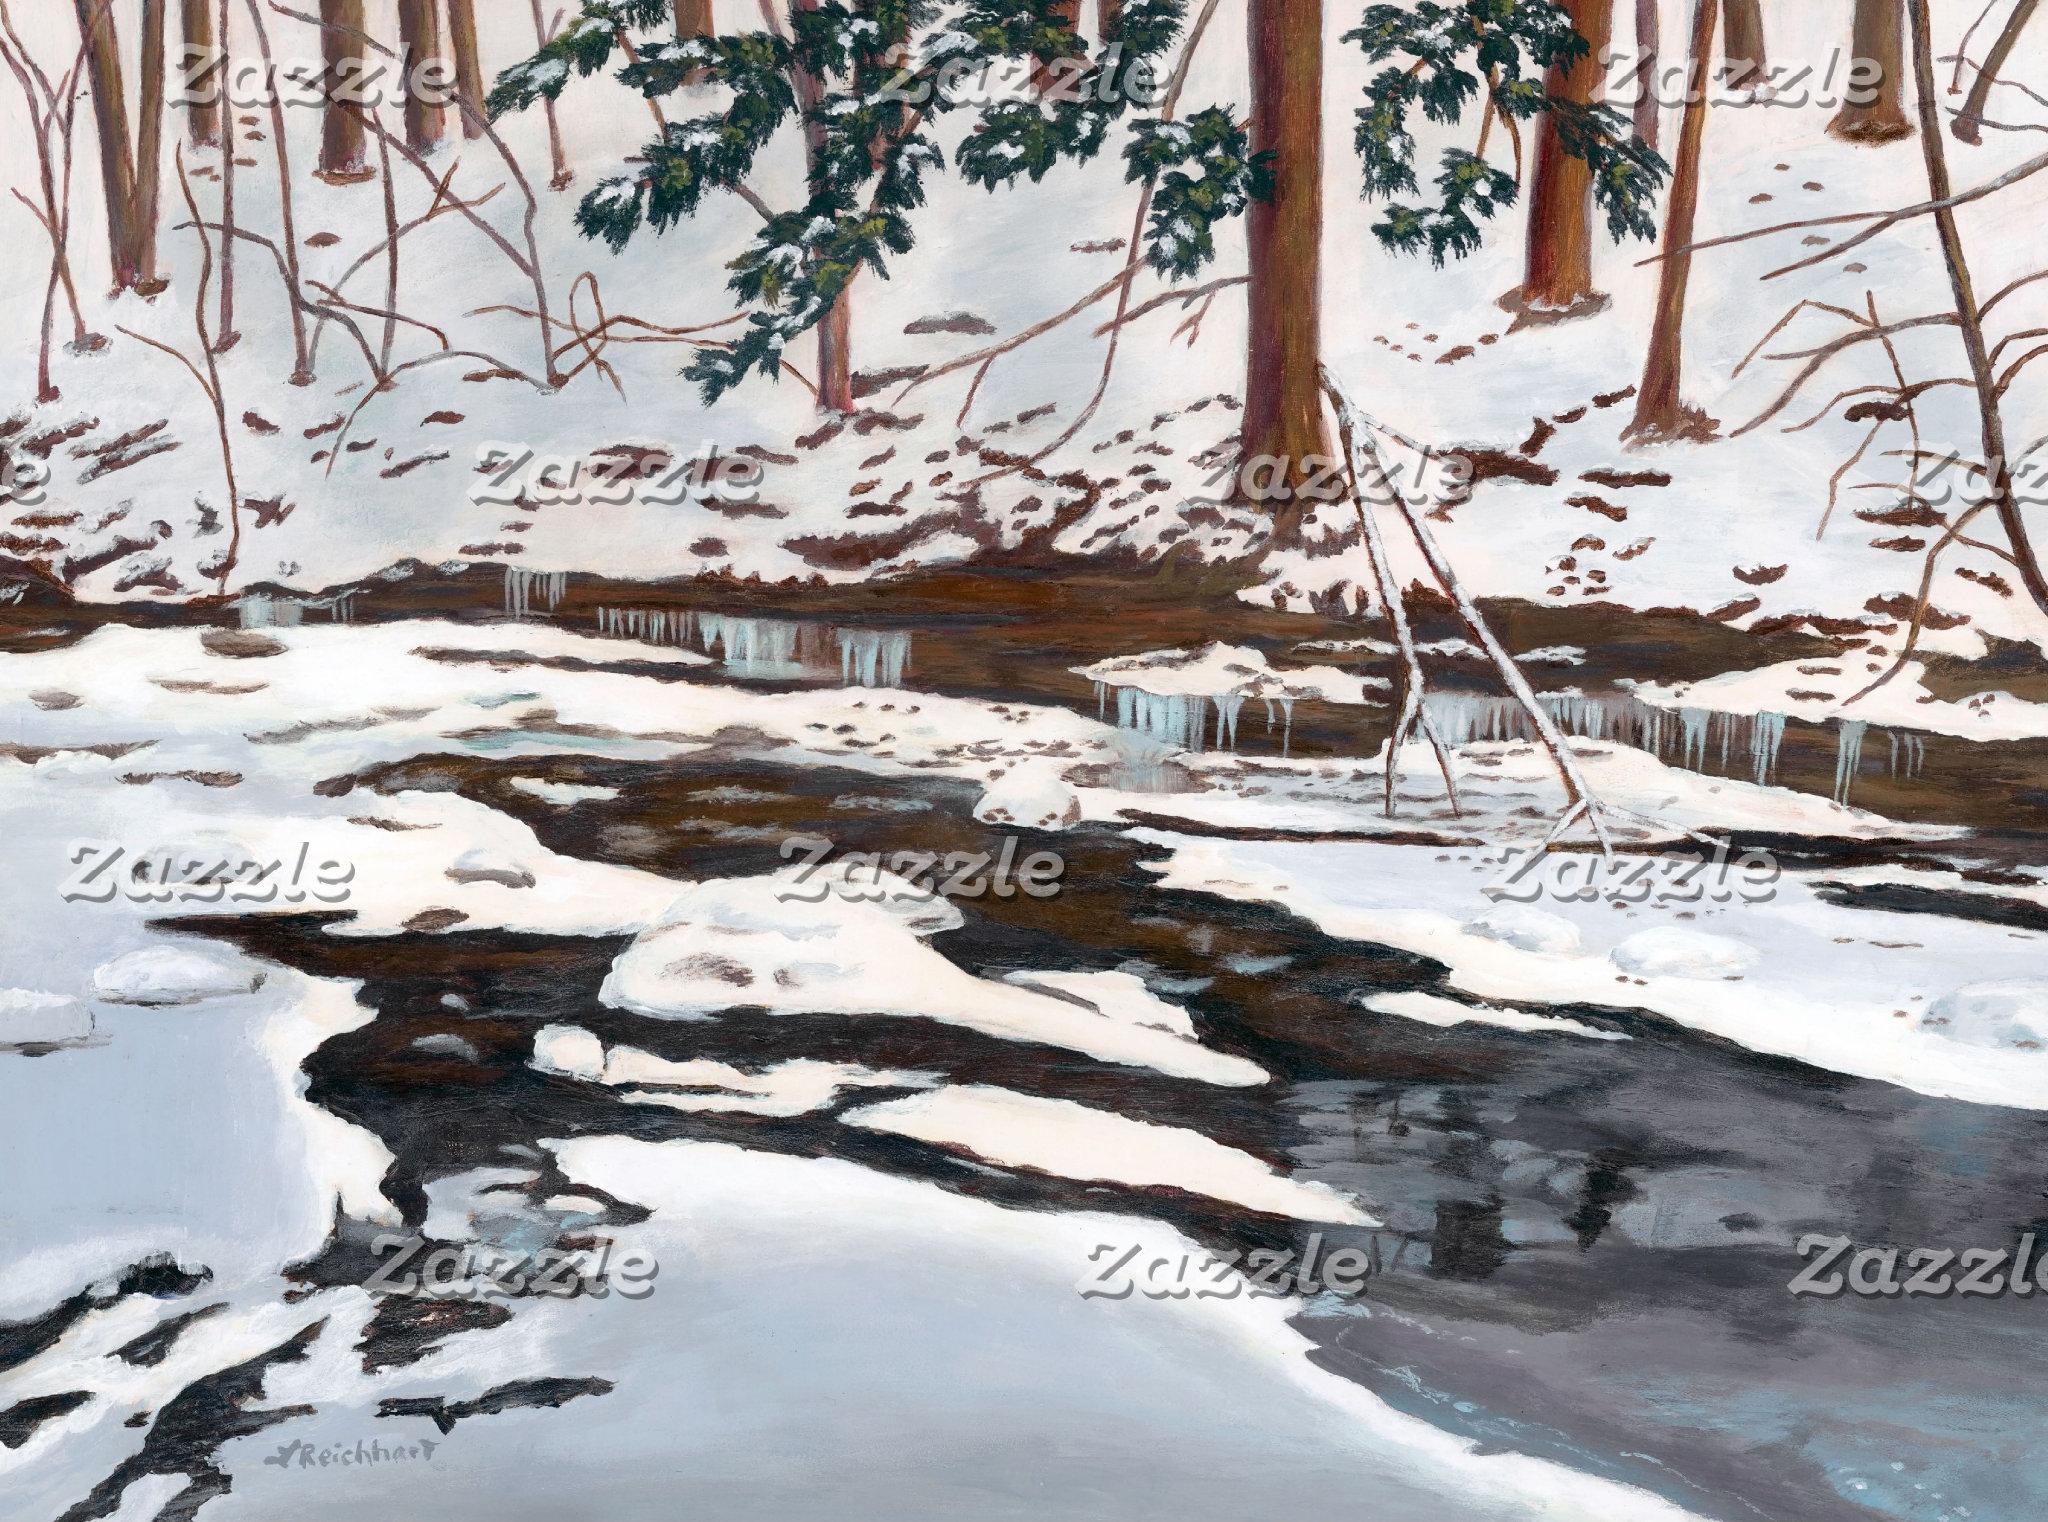 Pixley in Winter